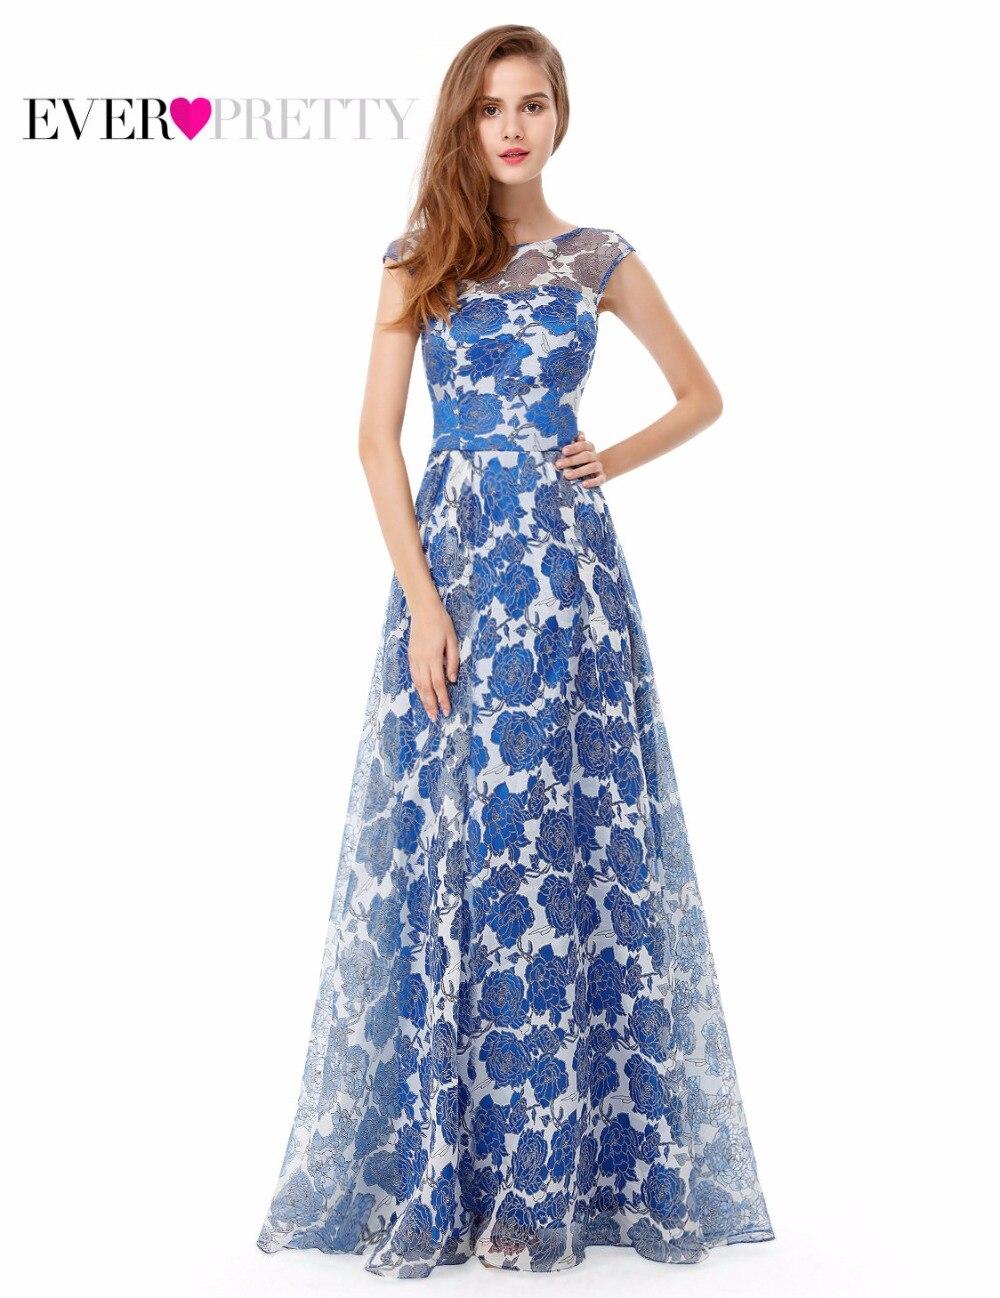 2017 New Arrival Prom Dress Long Womens Elegant Round Neck